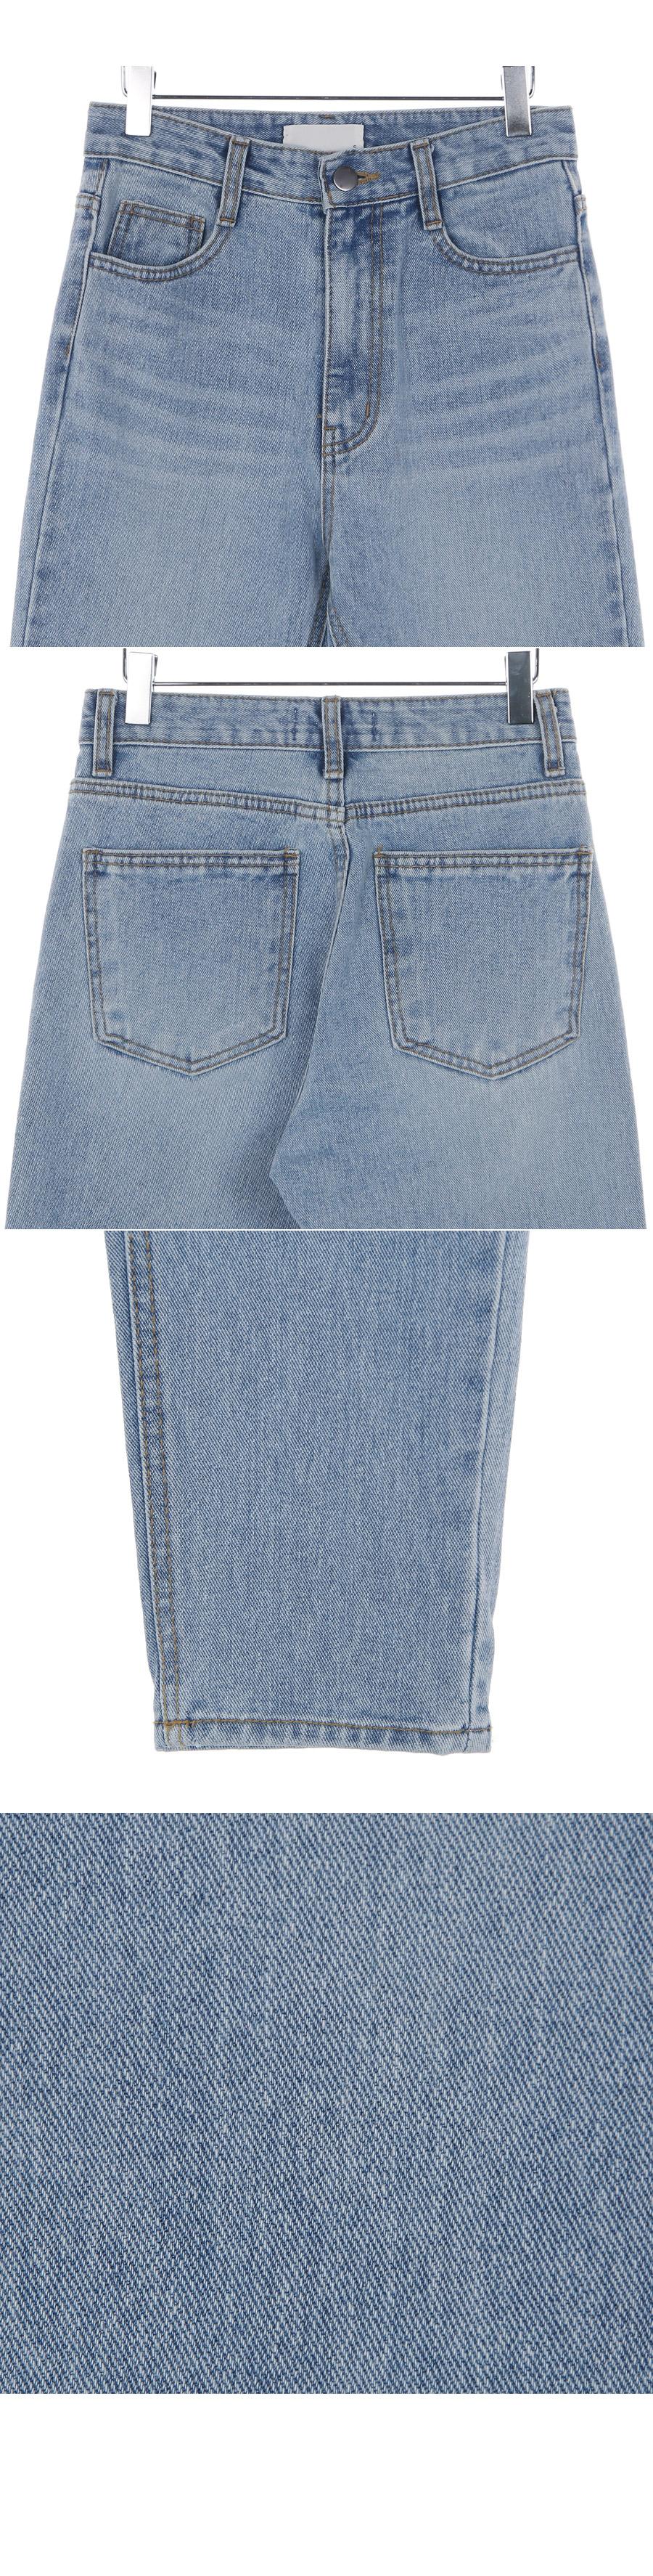 Loretta pants